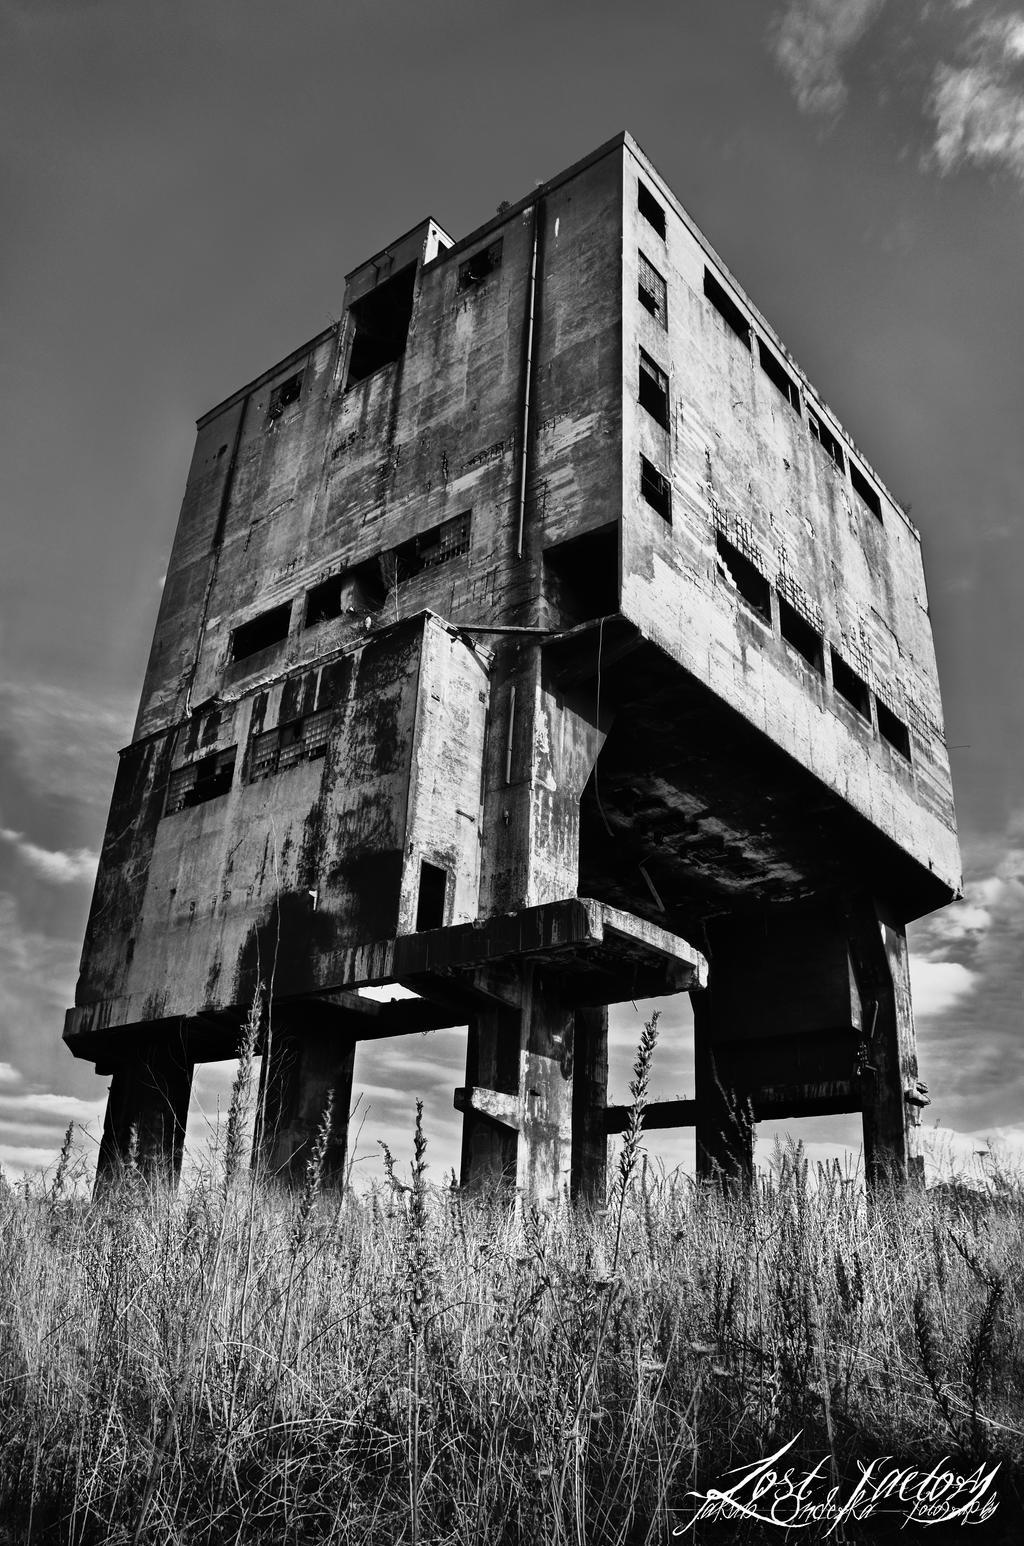 Lost factory by DZerWebdesign